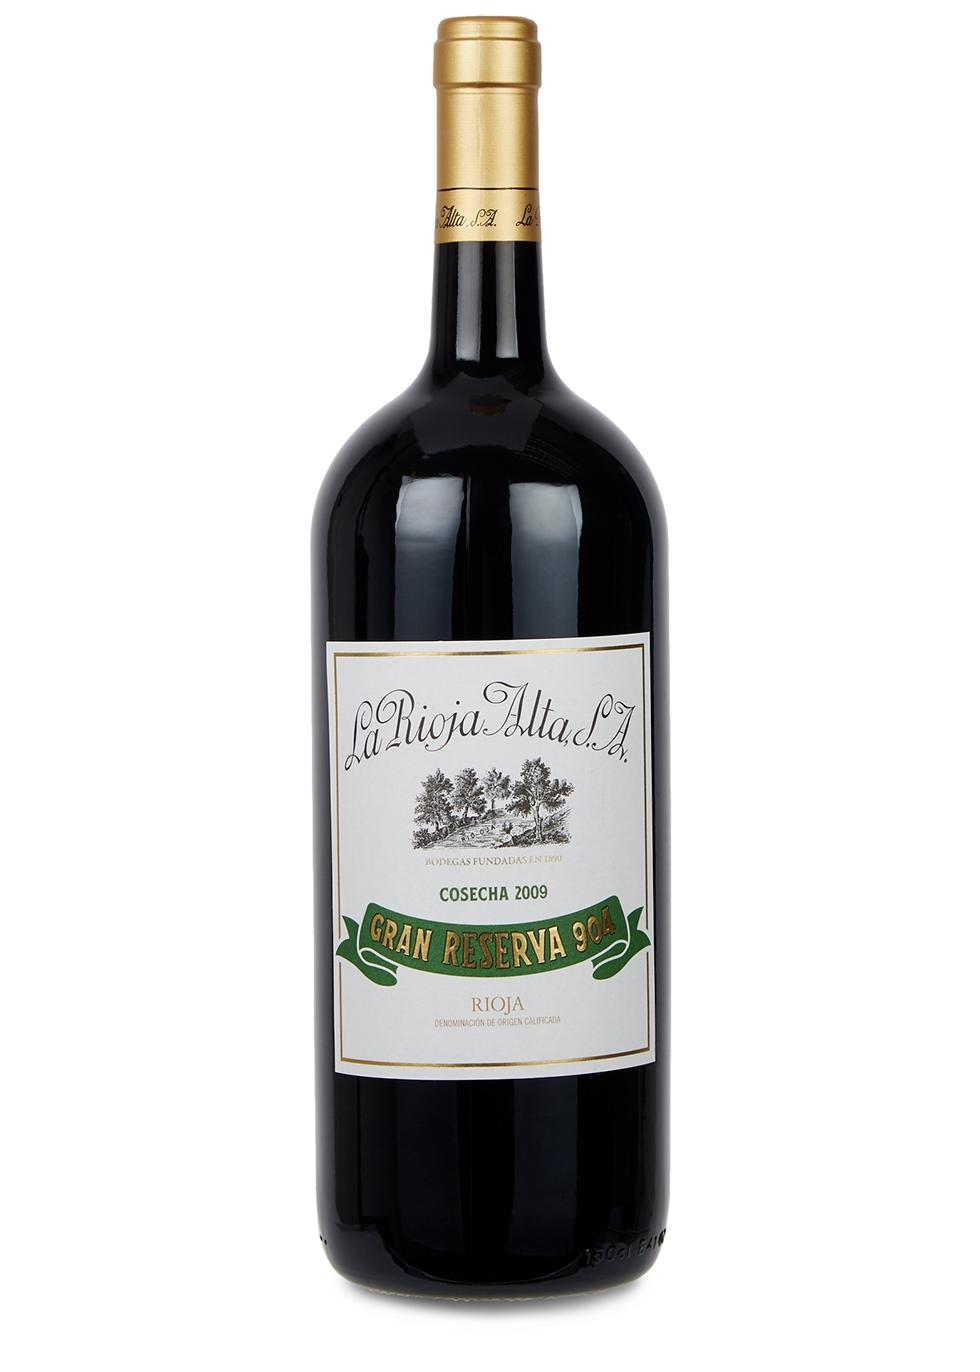 Gran Reserva 904 Rioja 2009 Magnum 1500ml